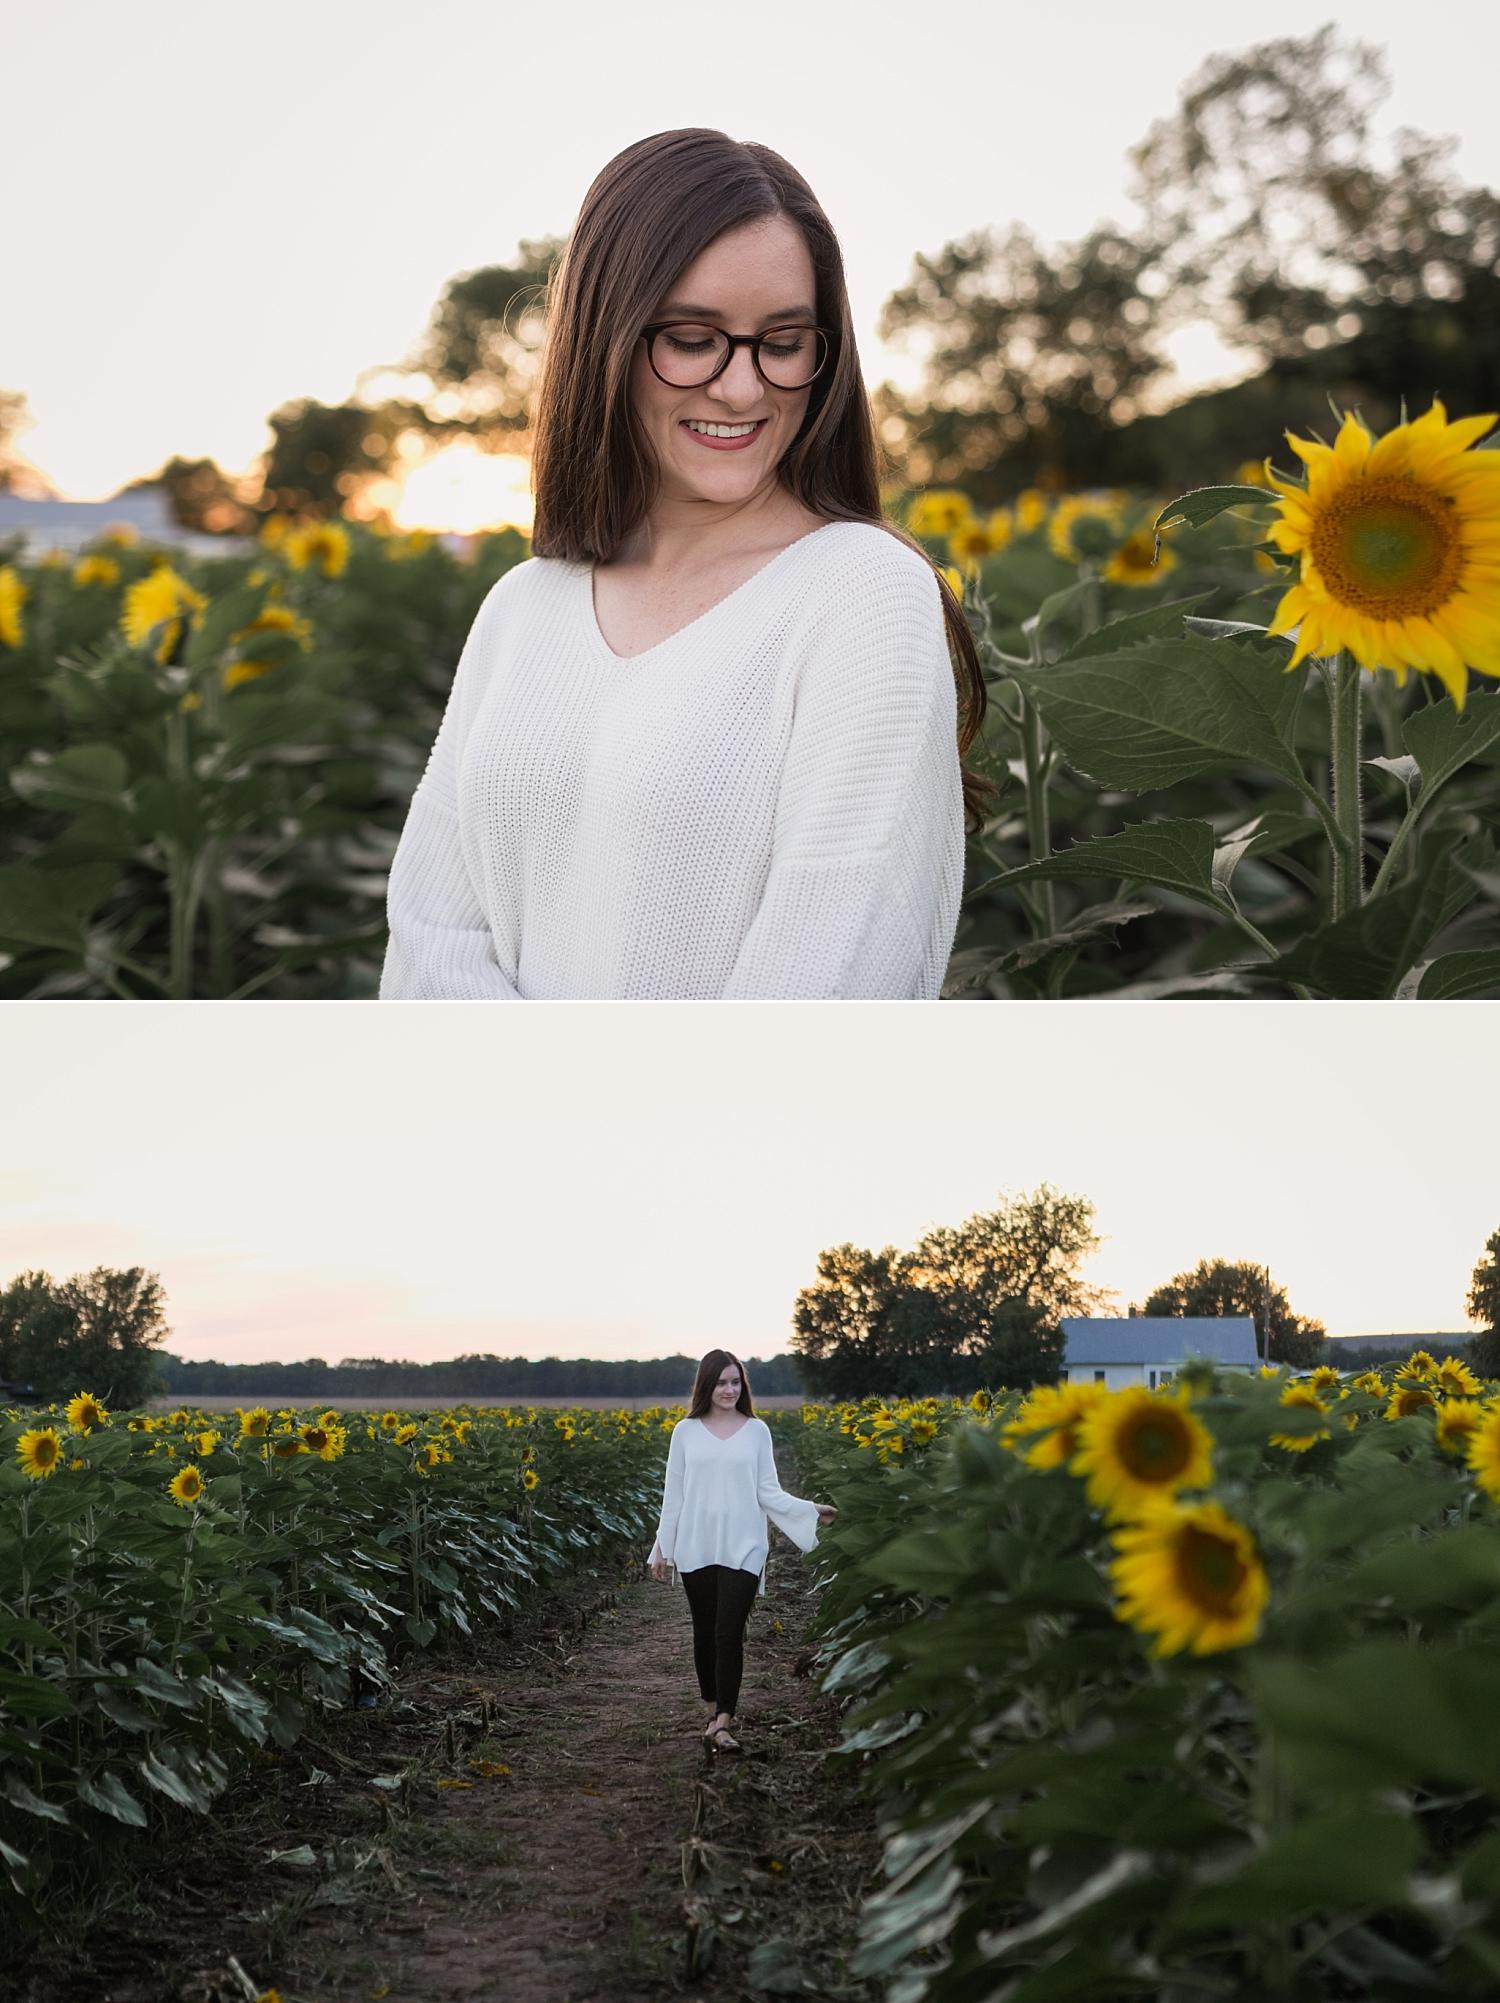 Sunflower-Photography-High-School-Mini-Session-Britts-Farm-Manhattan-KS